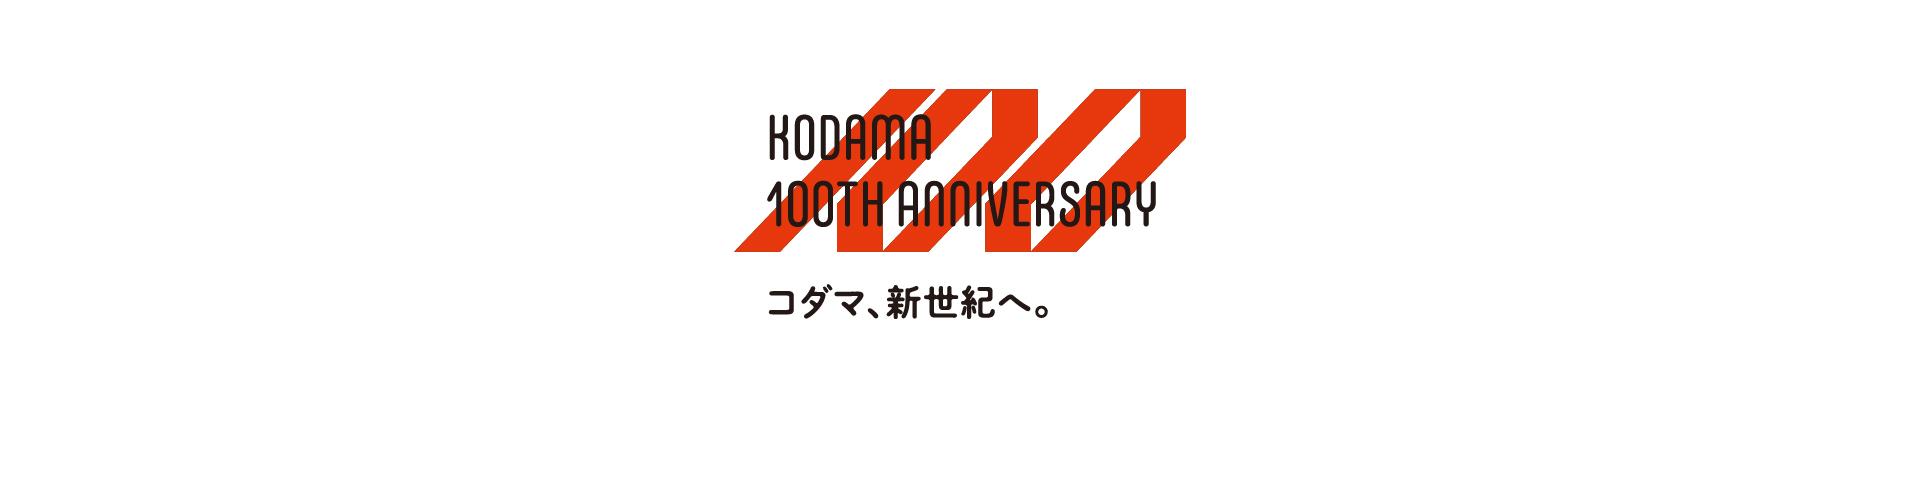 KODAMA 100th Anniversary